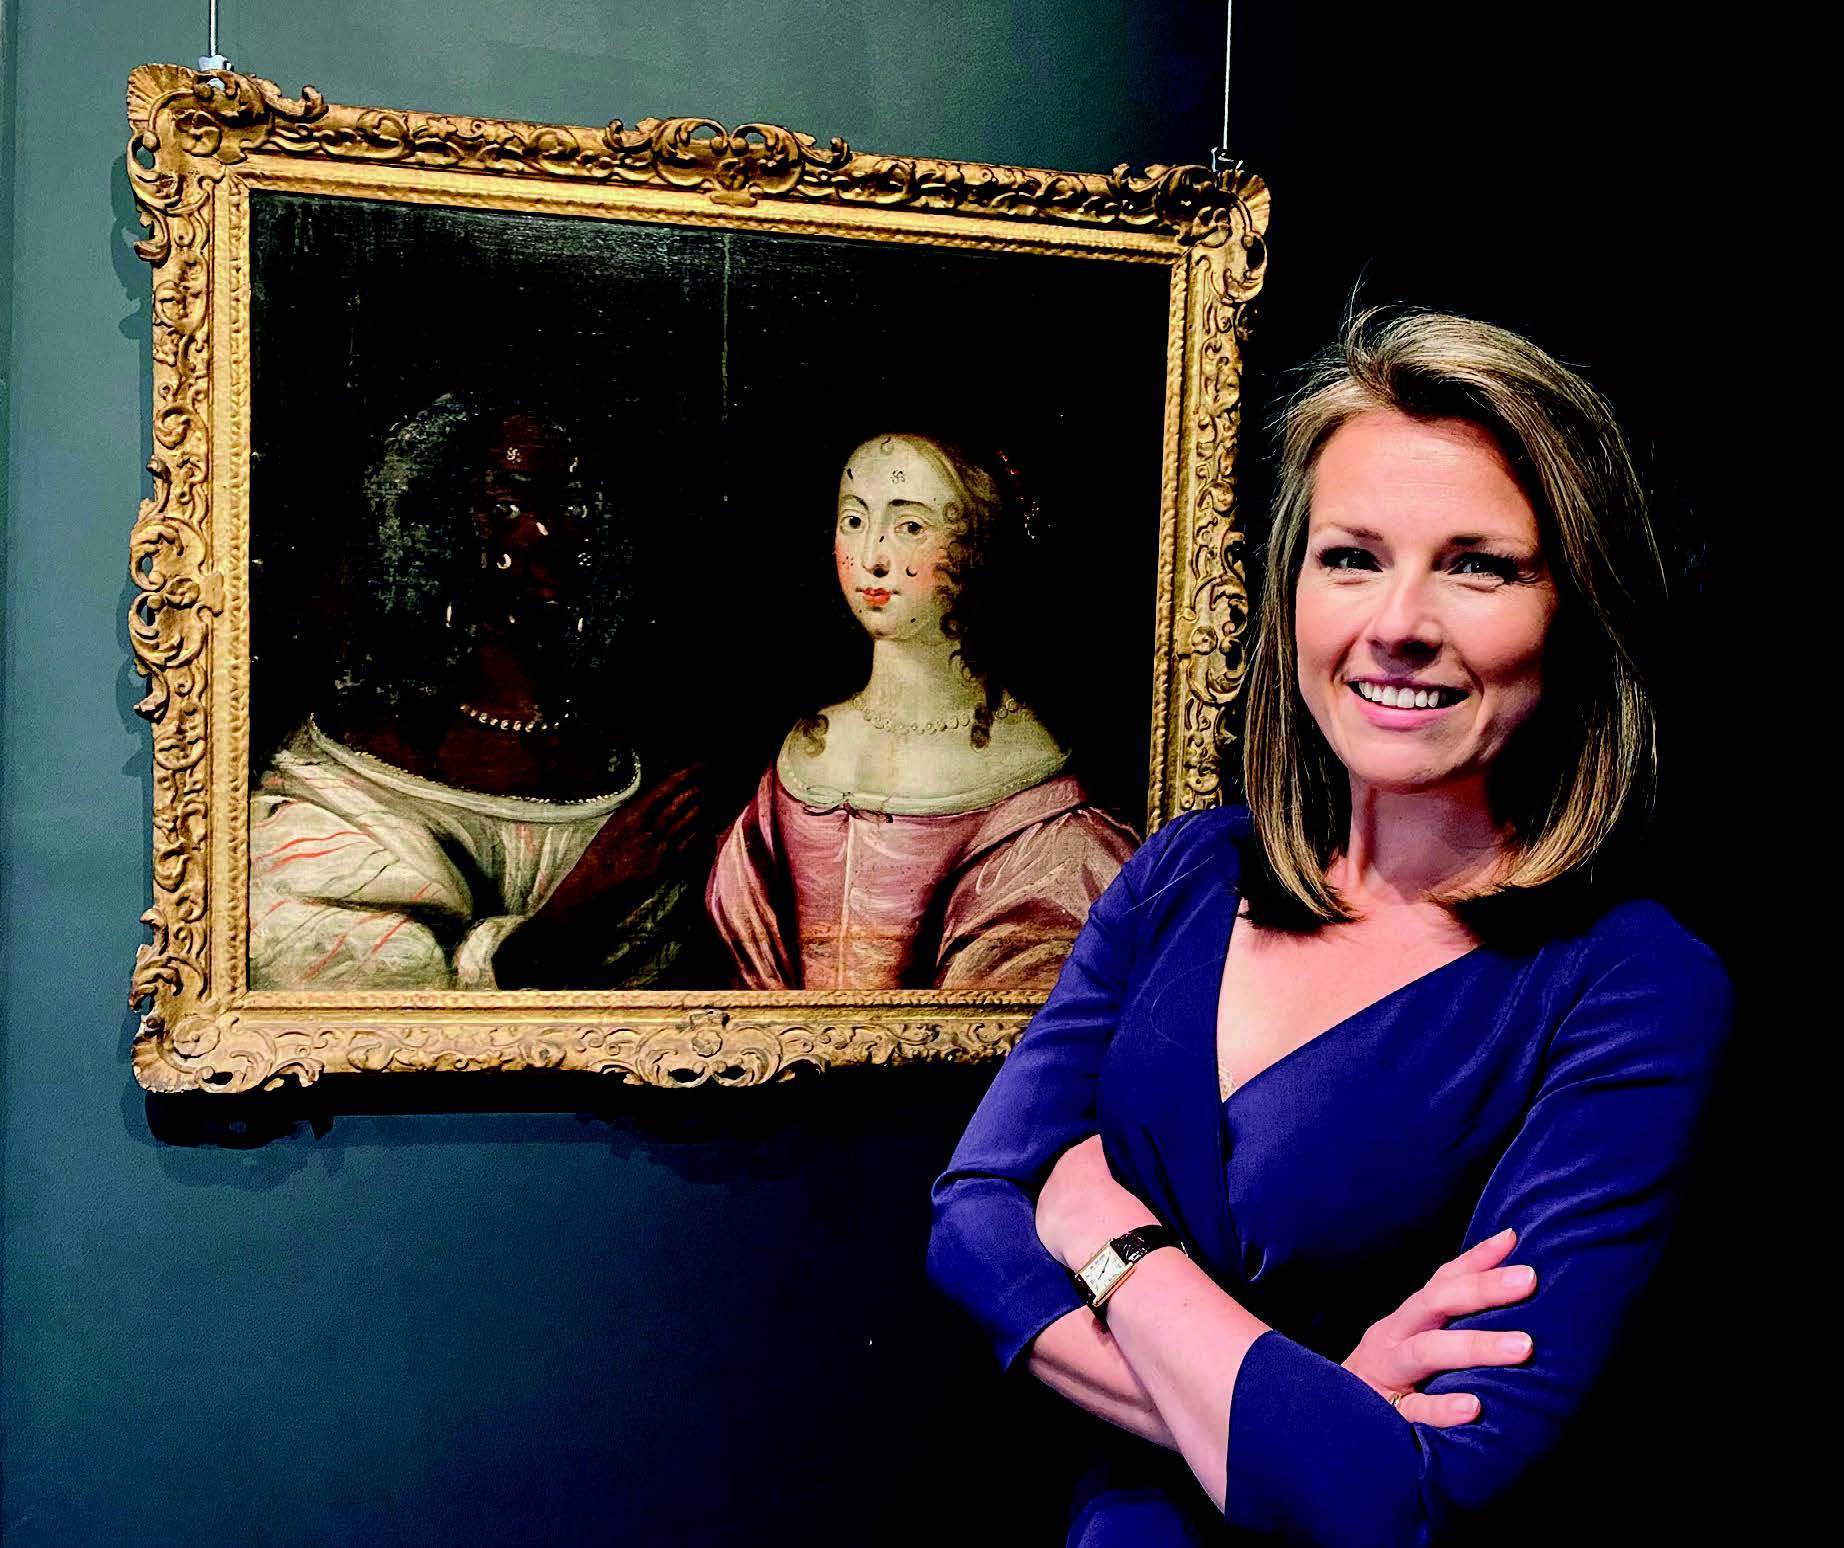 Christina Trevanion and a Cromwell era portrait of two women